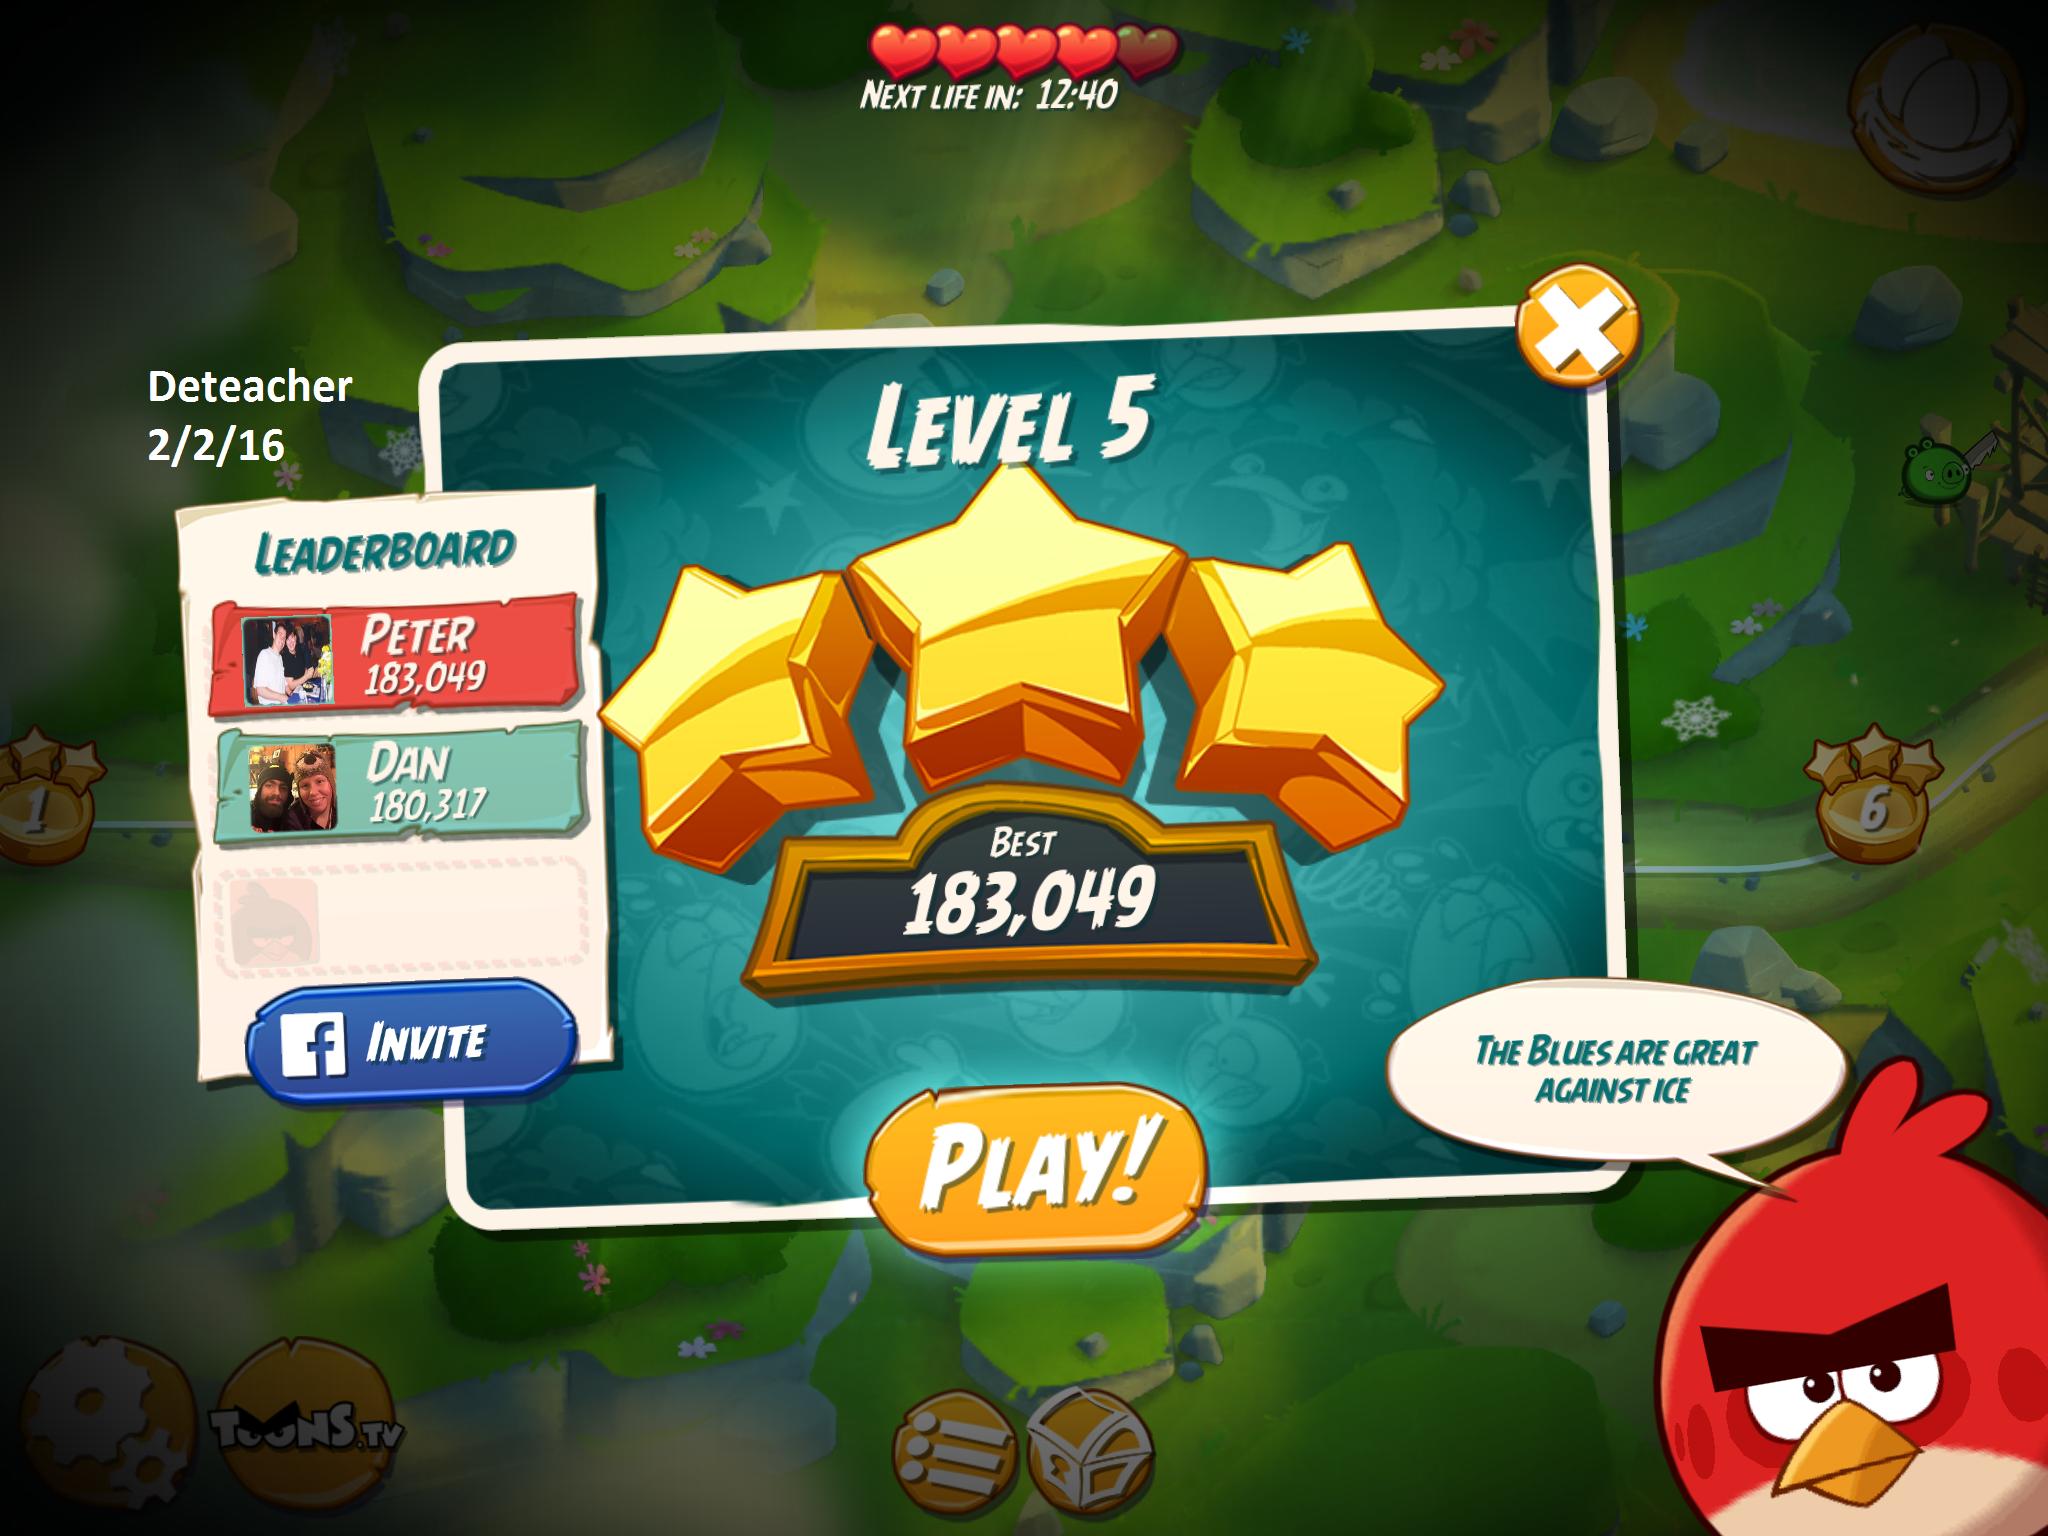 Deteacher: Angry Birds 2: Level 5 (iOS) 183,049 points on 2016-02-02 18:21:55